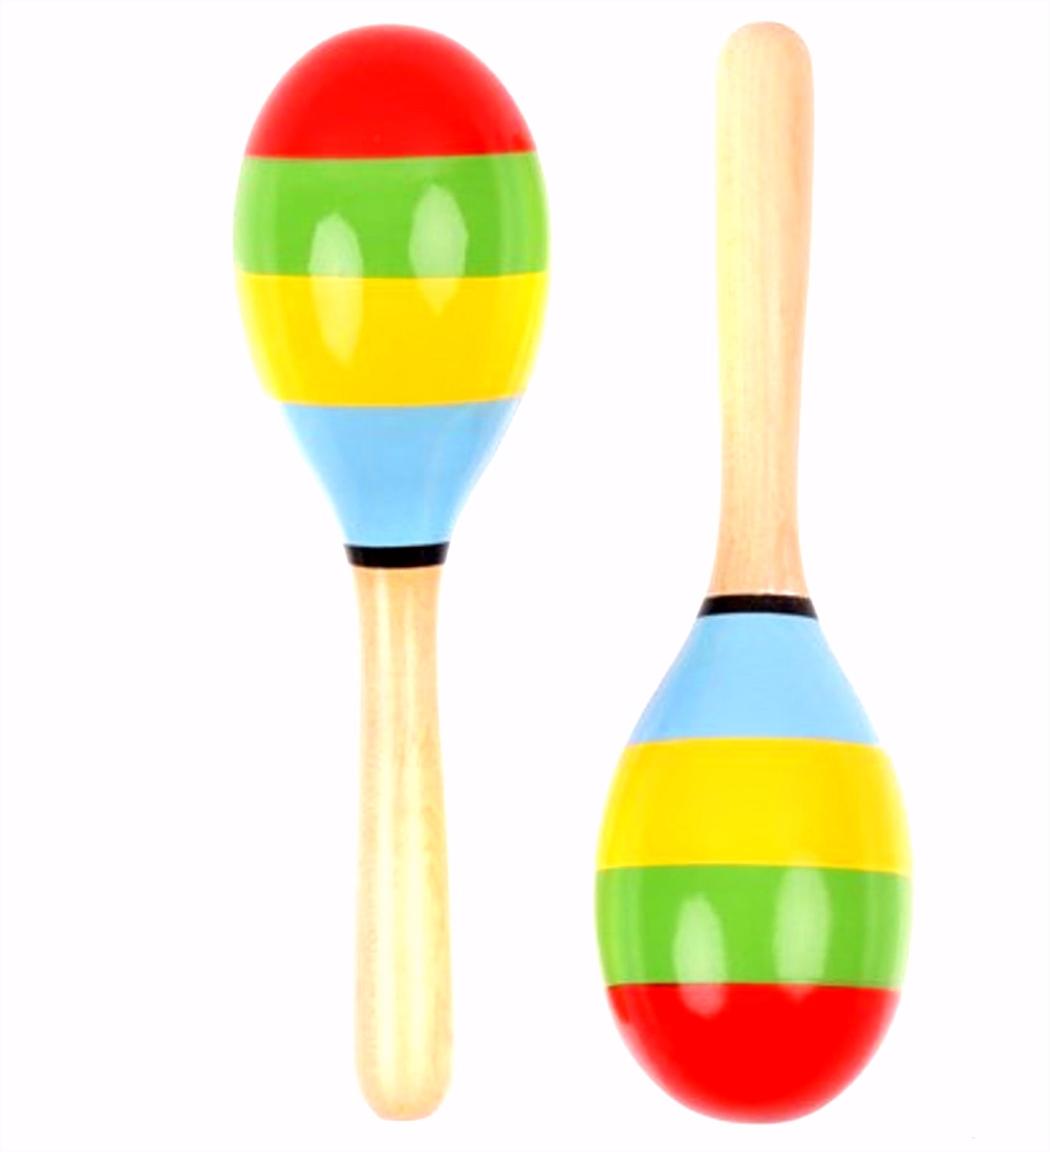 bol Handgemaakte houten sambaballen maracas Vilac